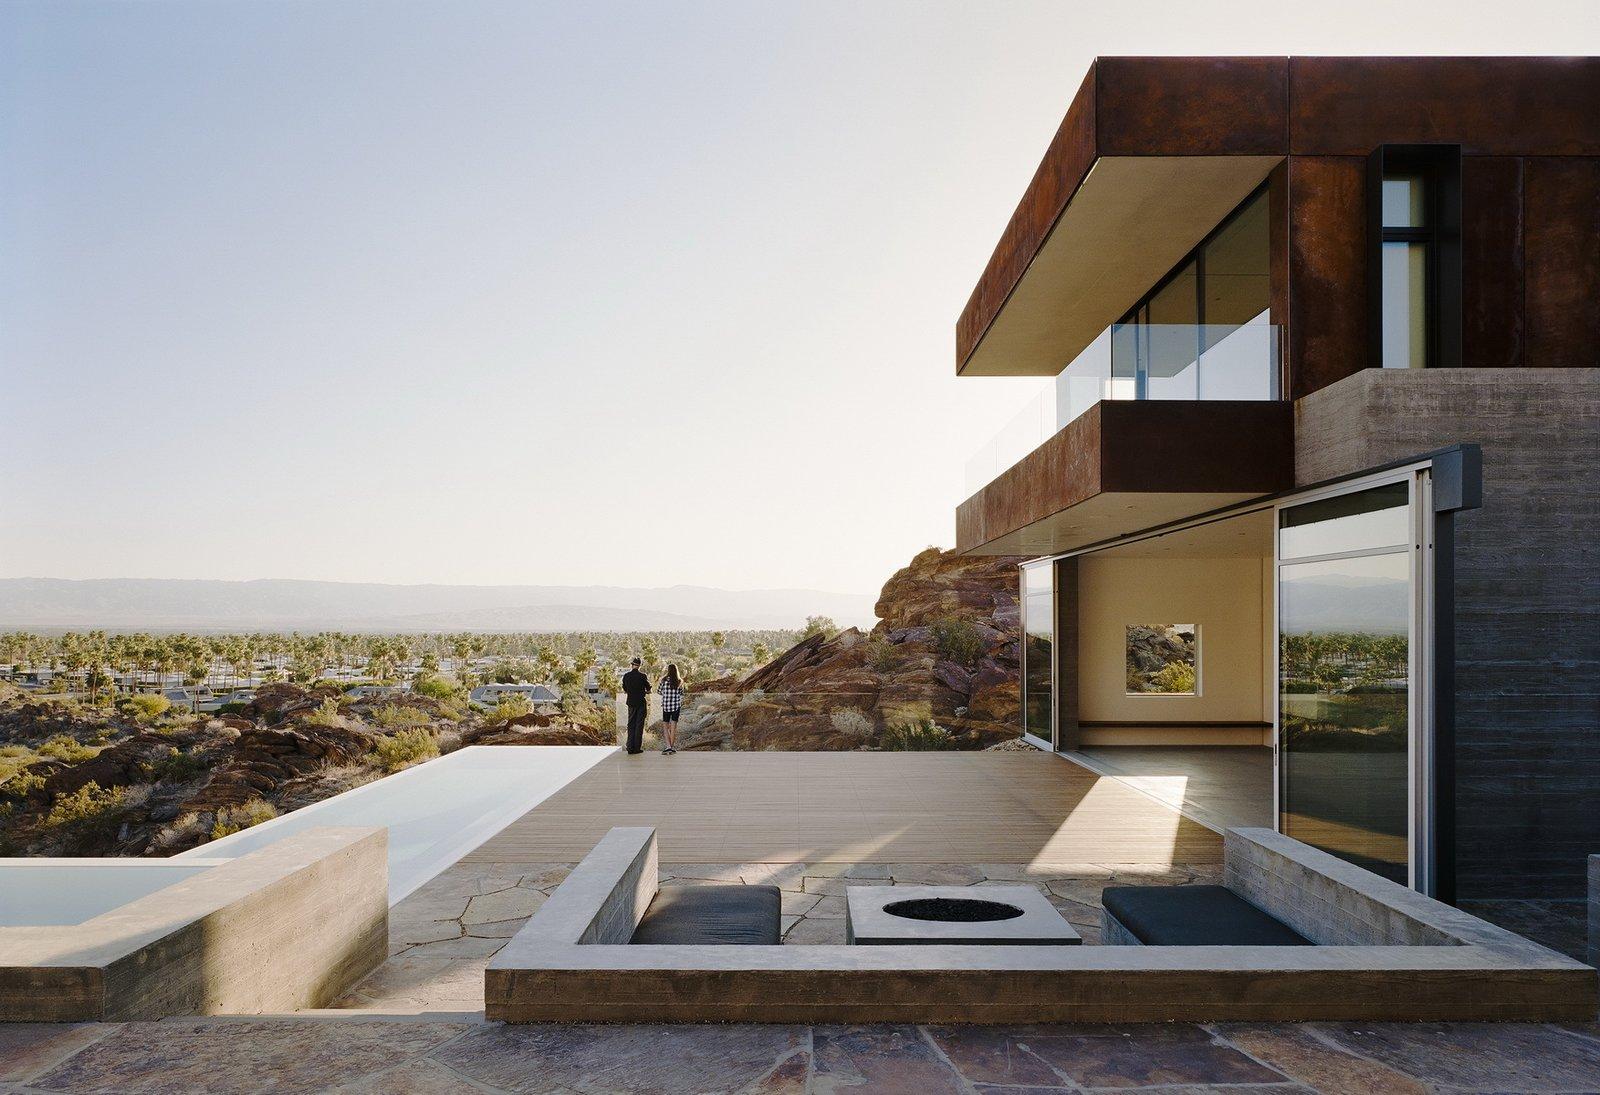 Outdoor, Back Yard, Shrubs, Slope, Boulders, Desert, and Infinity  Outdoor Desert Photos from Ridge Mountain Residence